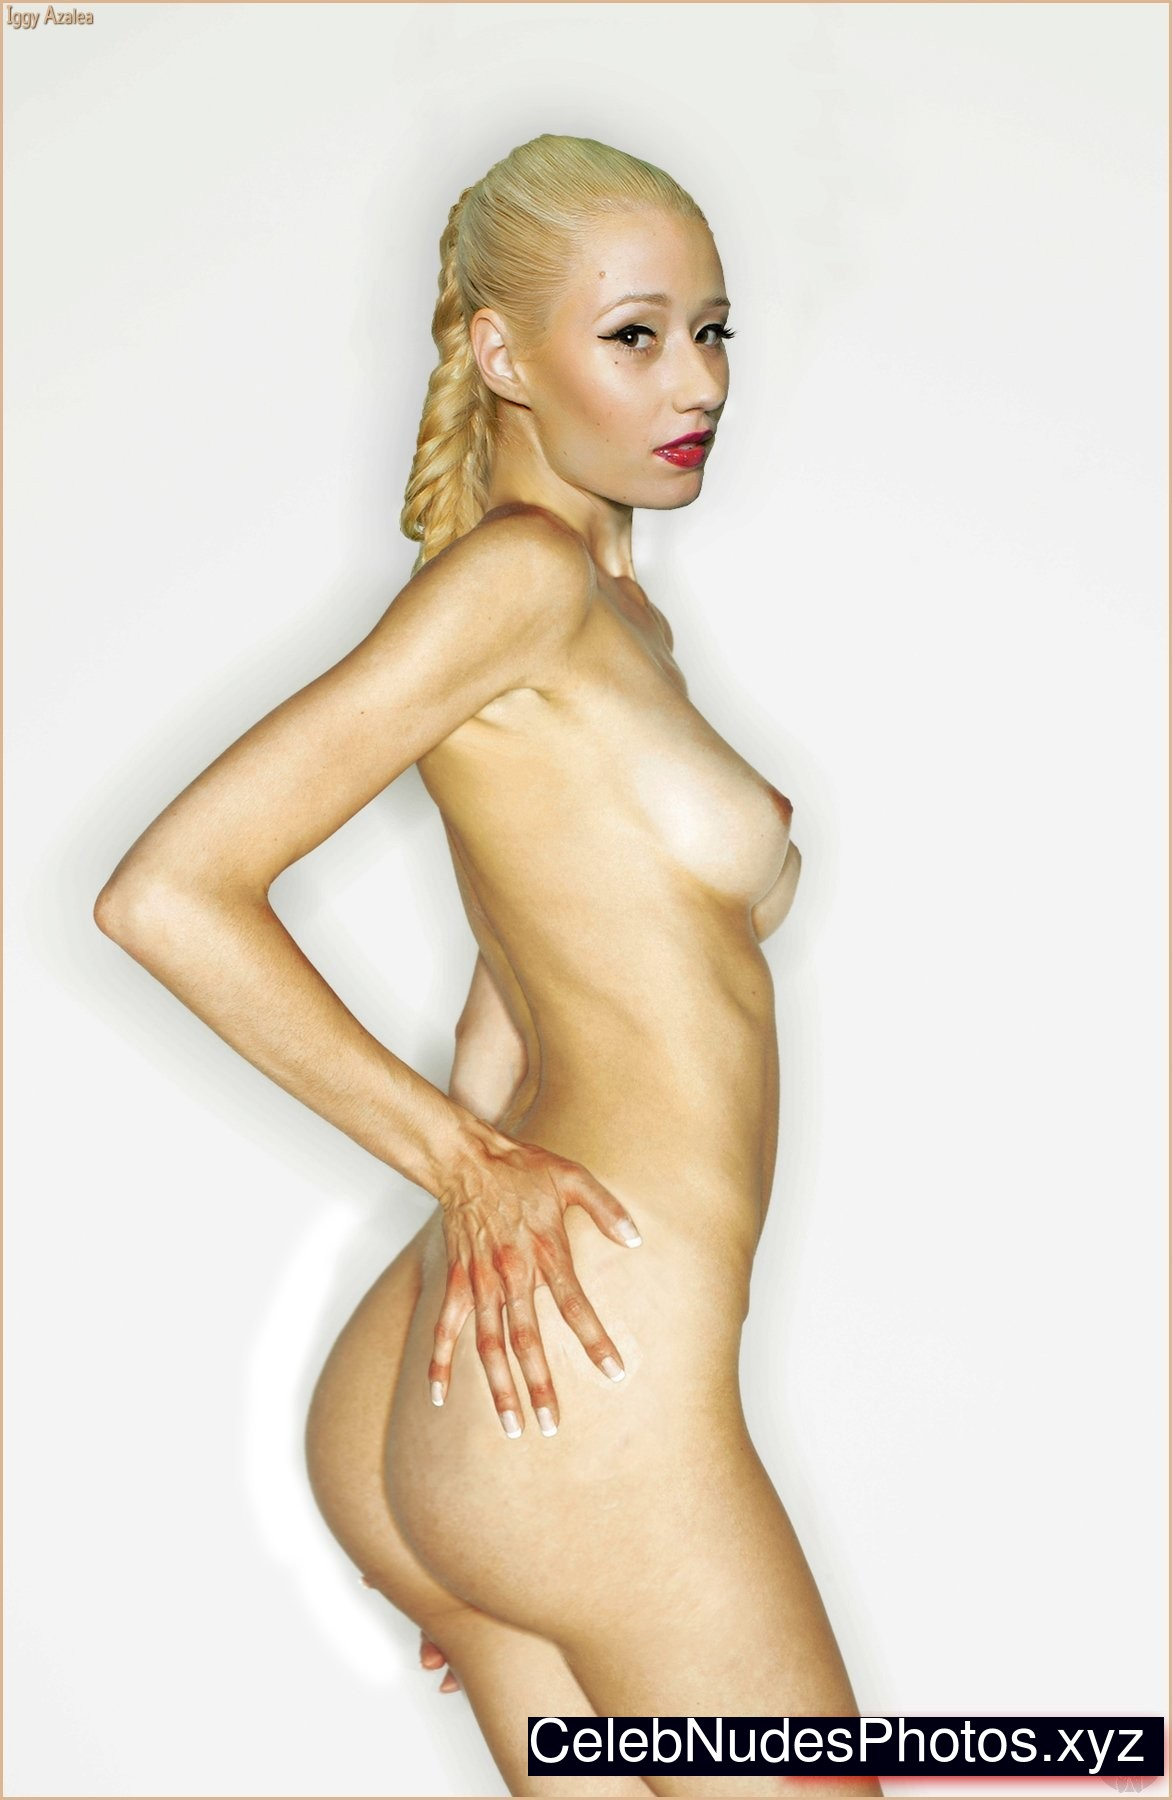 Iggy Azalea nude celeb pics